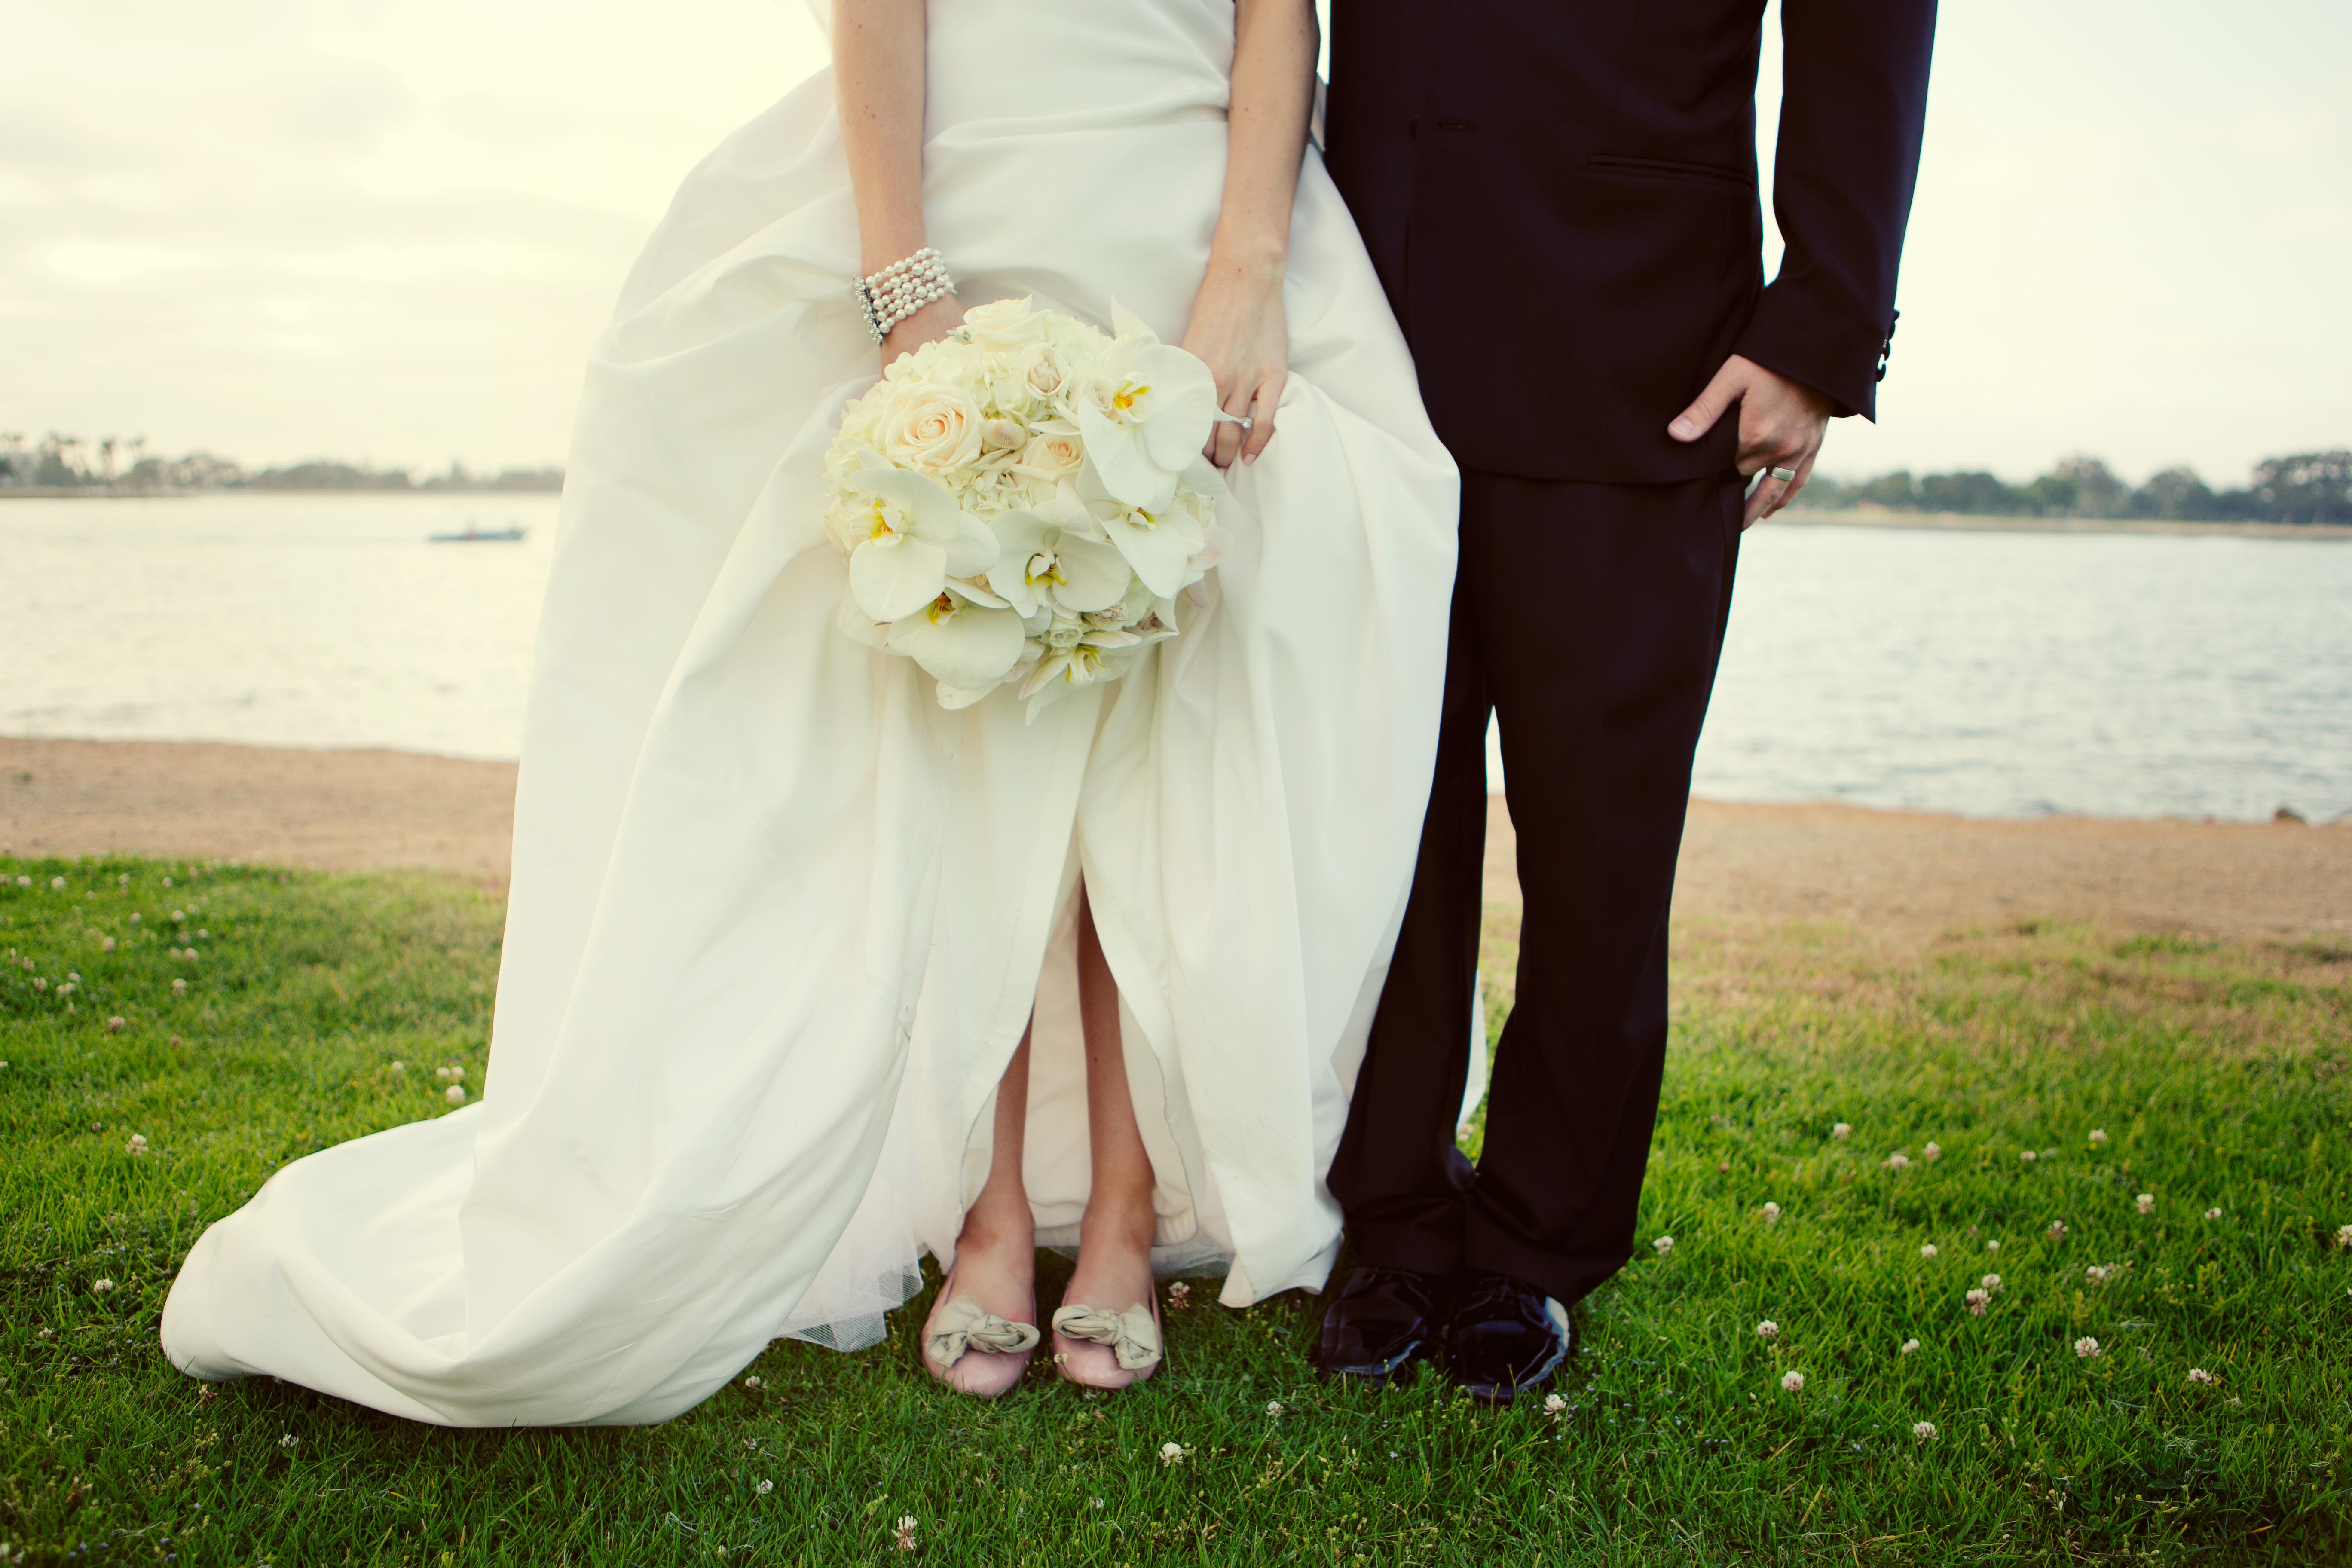 Kurfman wedding